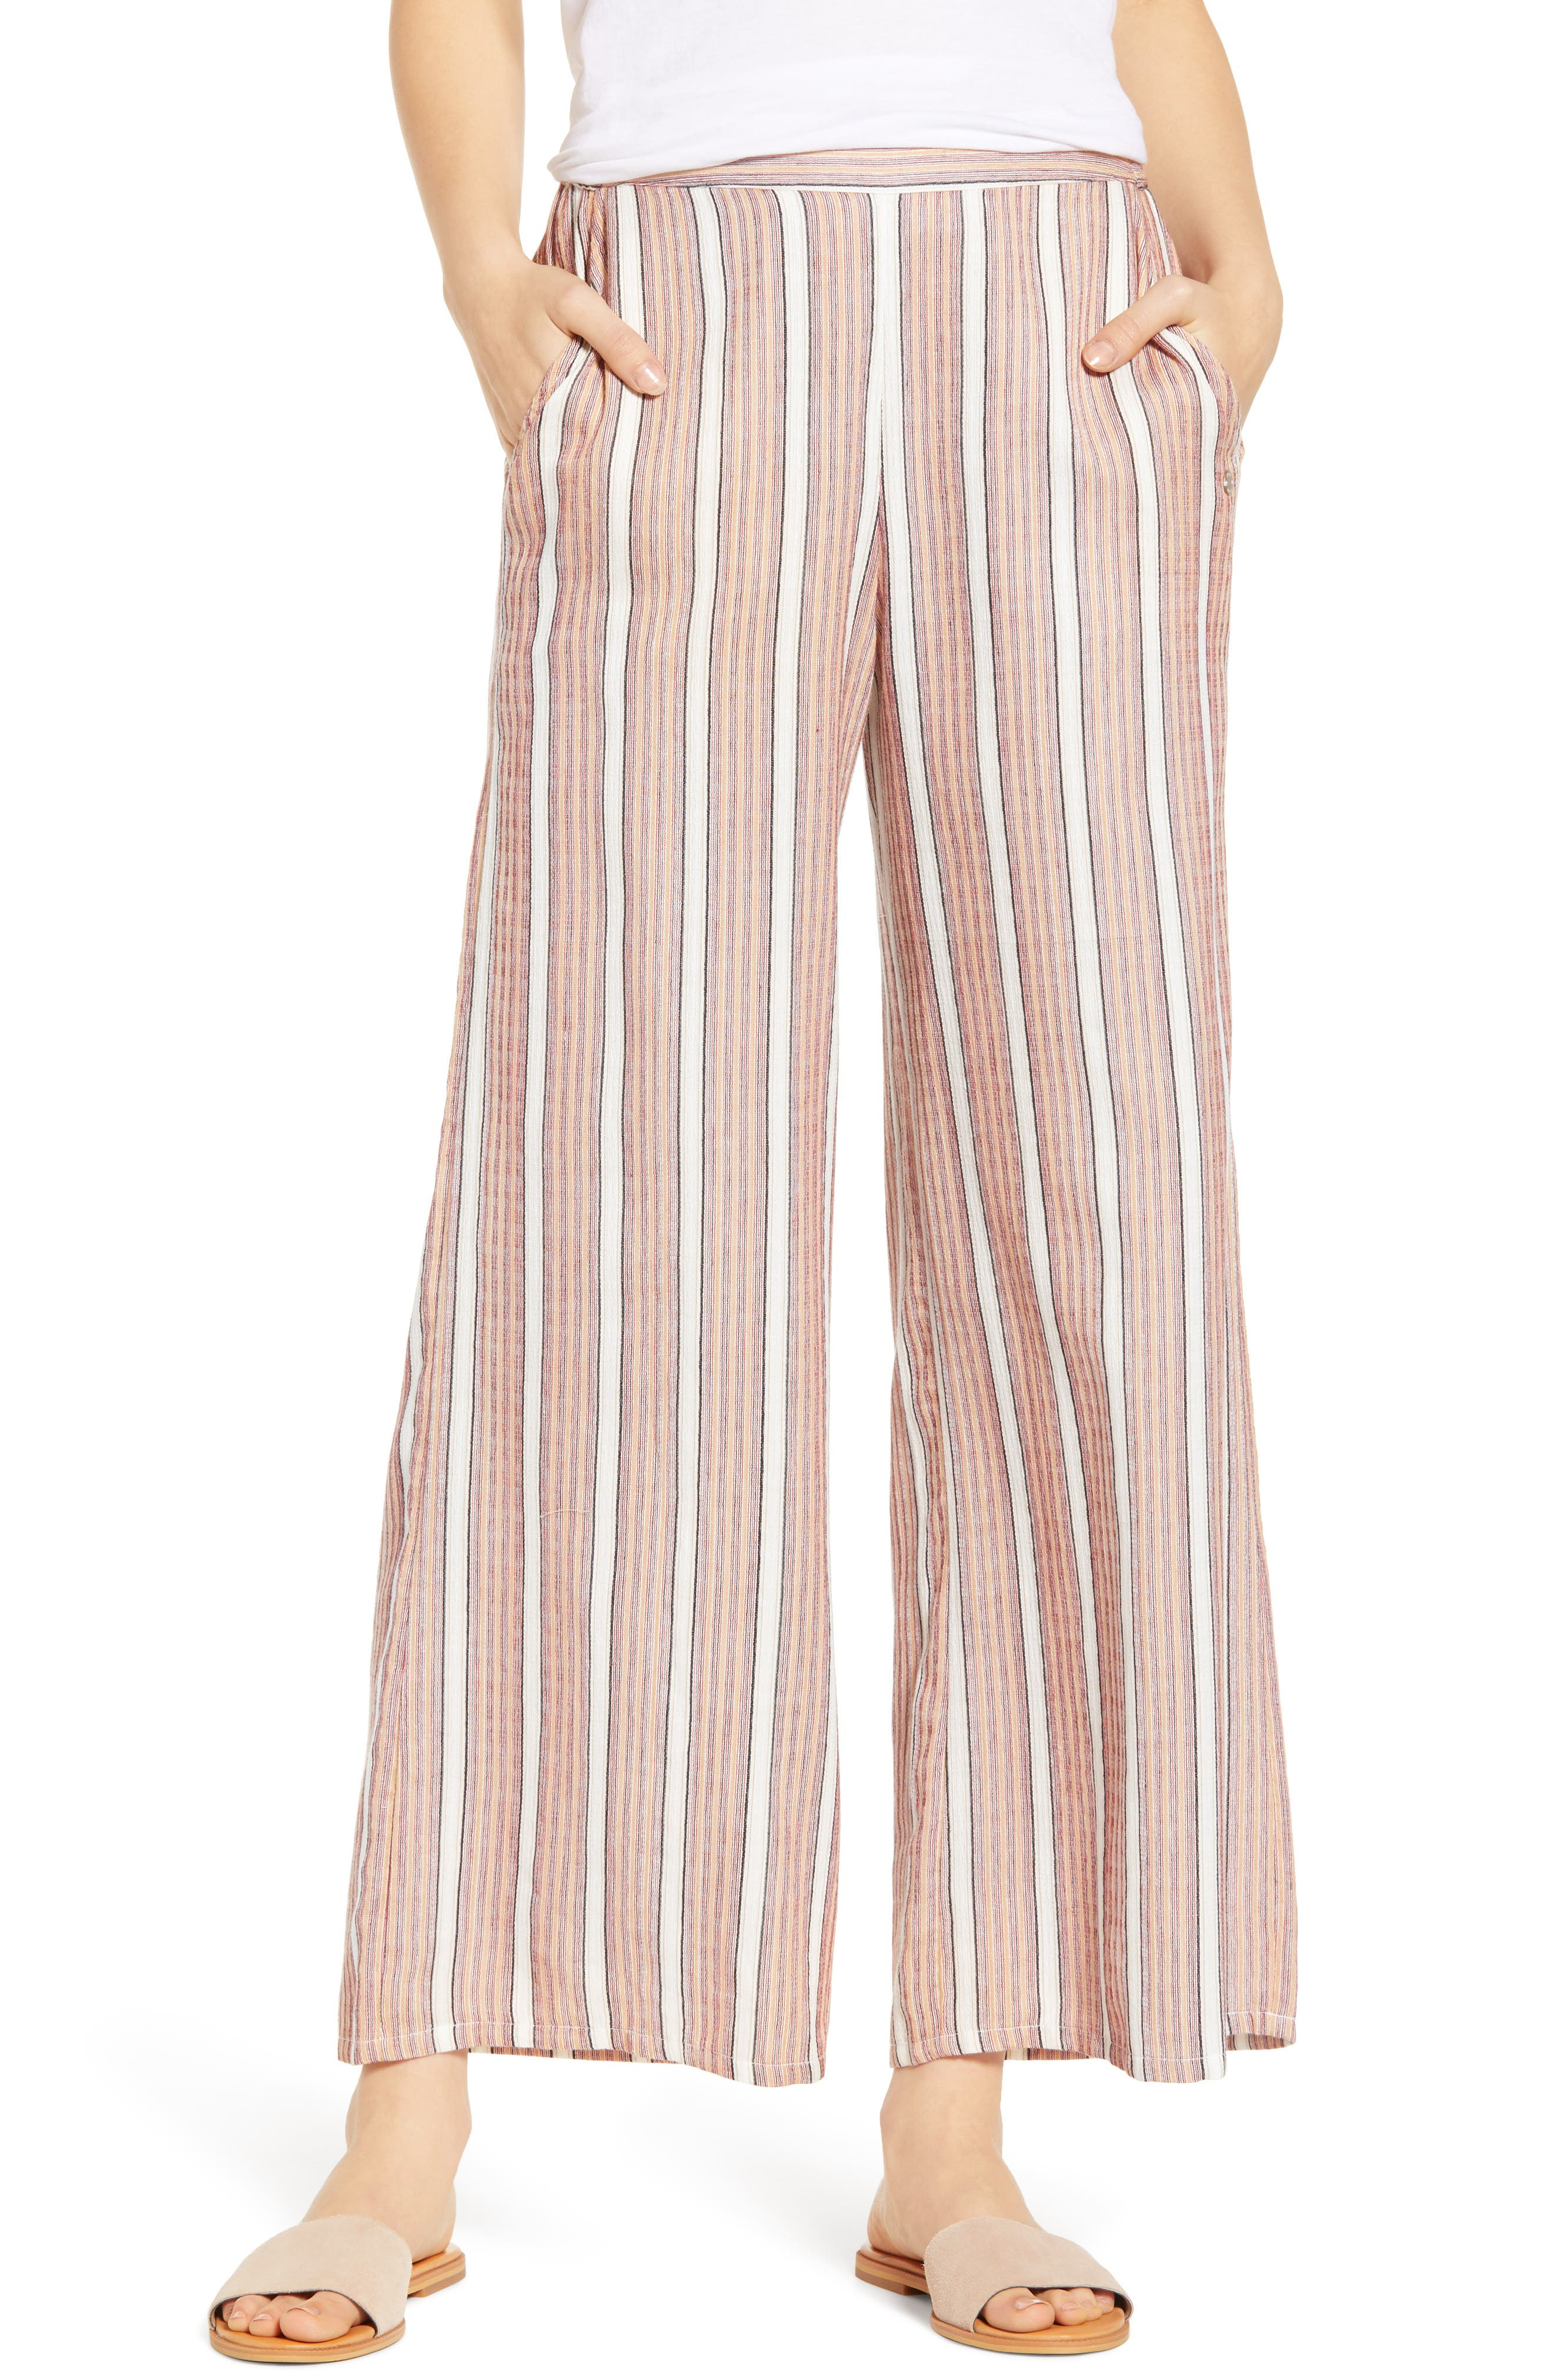 Midnight Avenue Stripe Pants,                             Main thumbnail 1, color,                             AMERICAN BEAUTY MULTI STRIPES